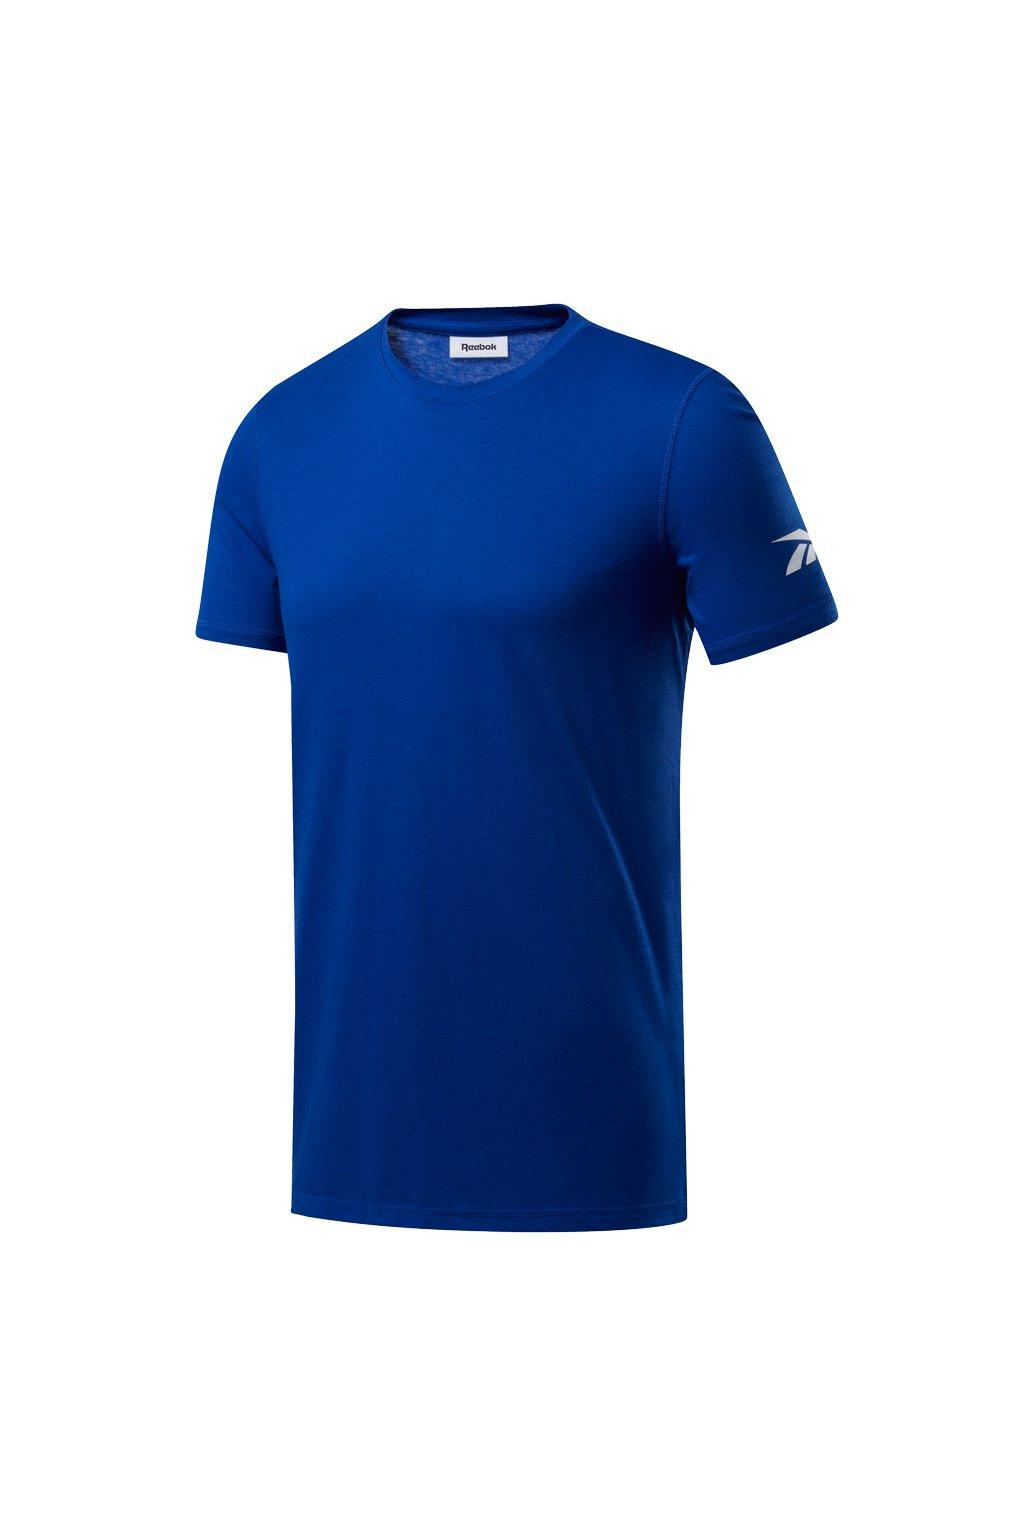 Pánske tričko Reebok Wor We Commercial SS Tee modré FP9100